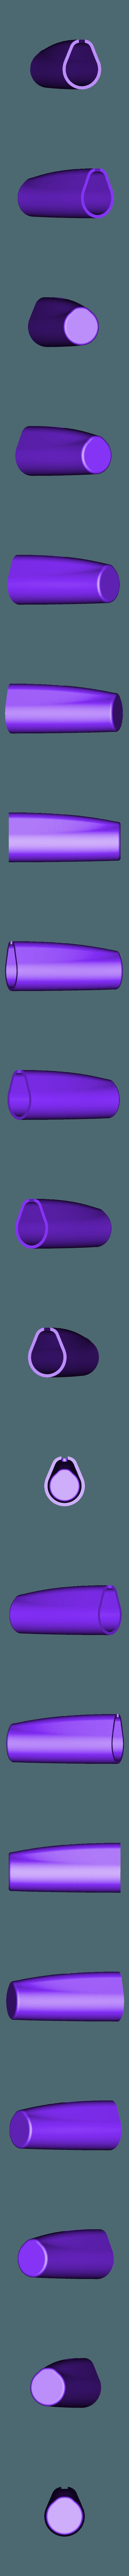 Zebco_Fishing_Rod_Cap_v1-3.STL Download free STL file Fishing Pole v2 • Model to 3D print, WalterHsiao